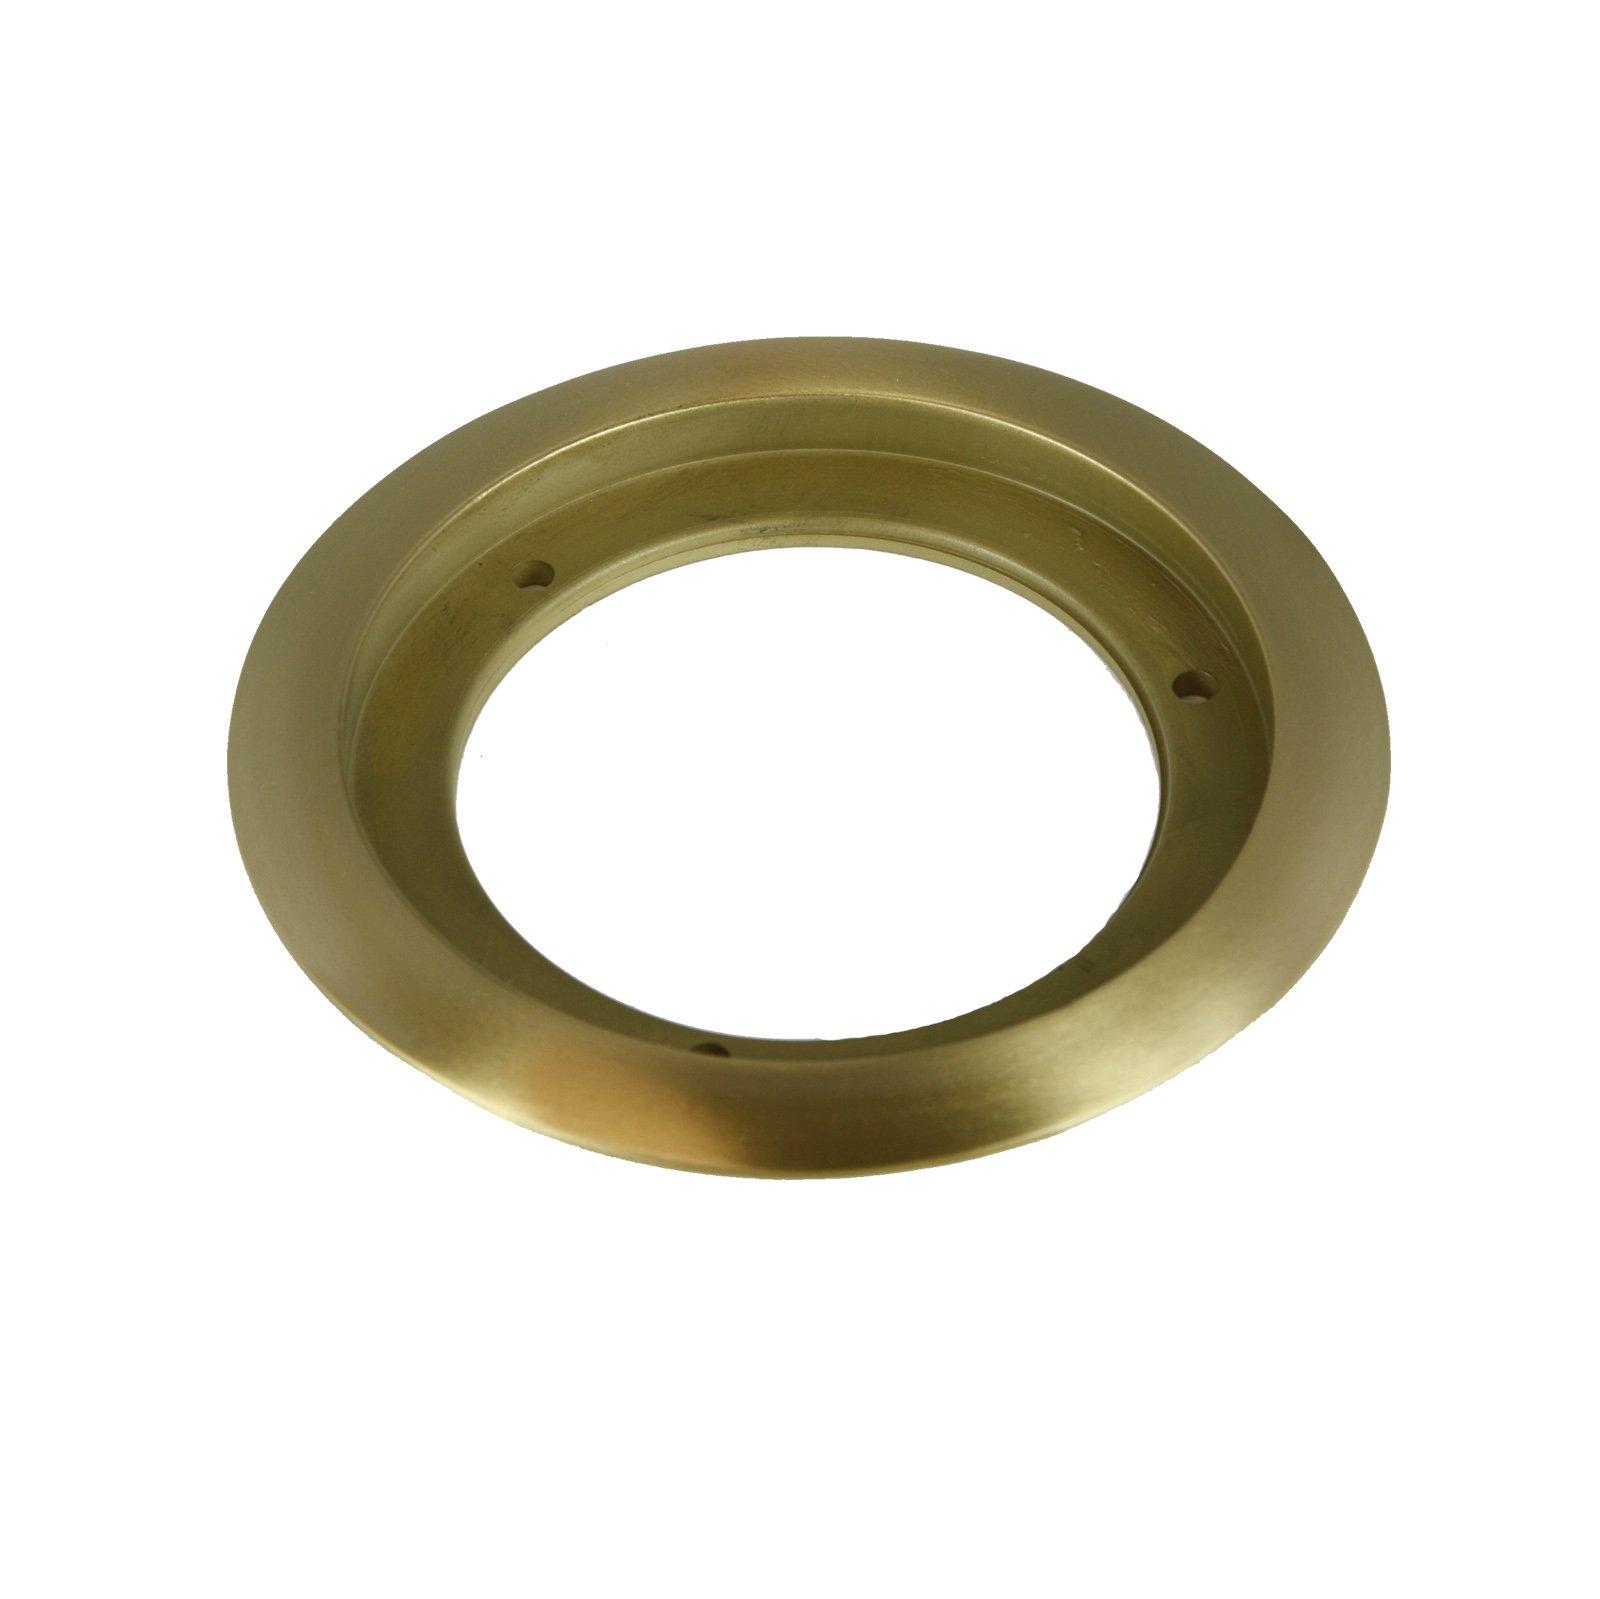 ENERLITES Recessed Flange Mounting Ring for Round 4'' Floor Box Covers, 5.25'' Diameter, Corrosive Resistant, 975518-C, Brass